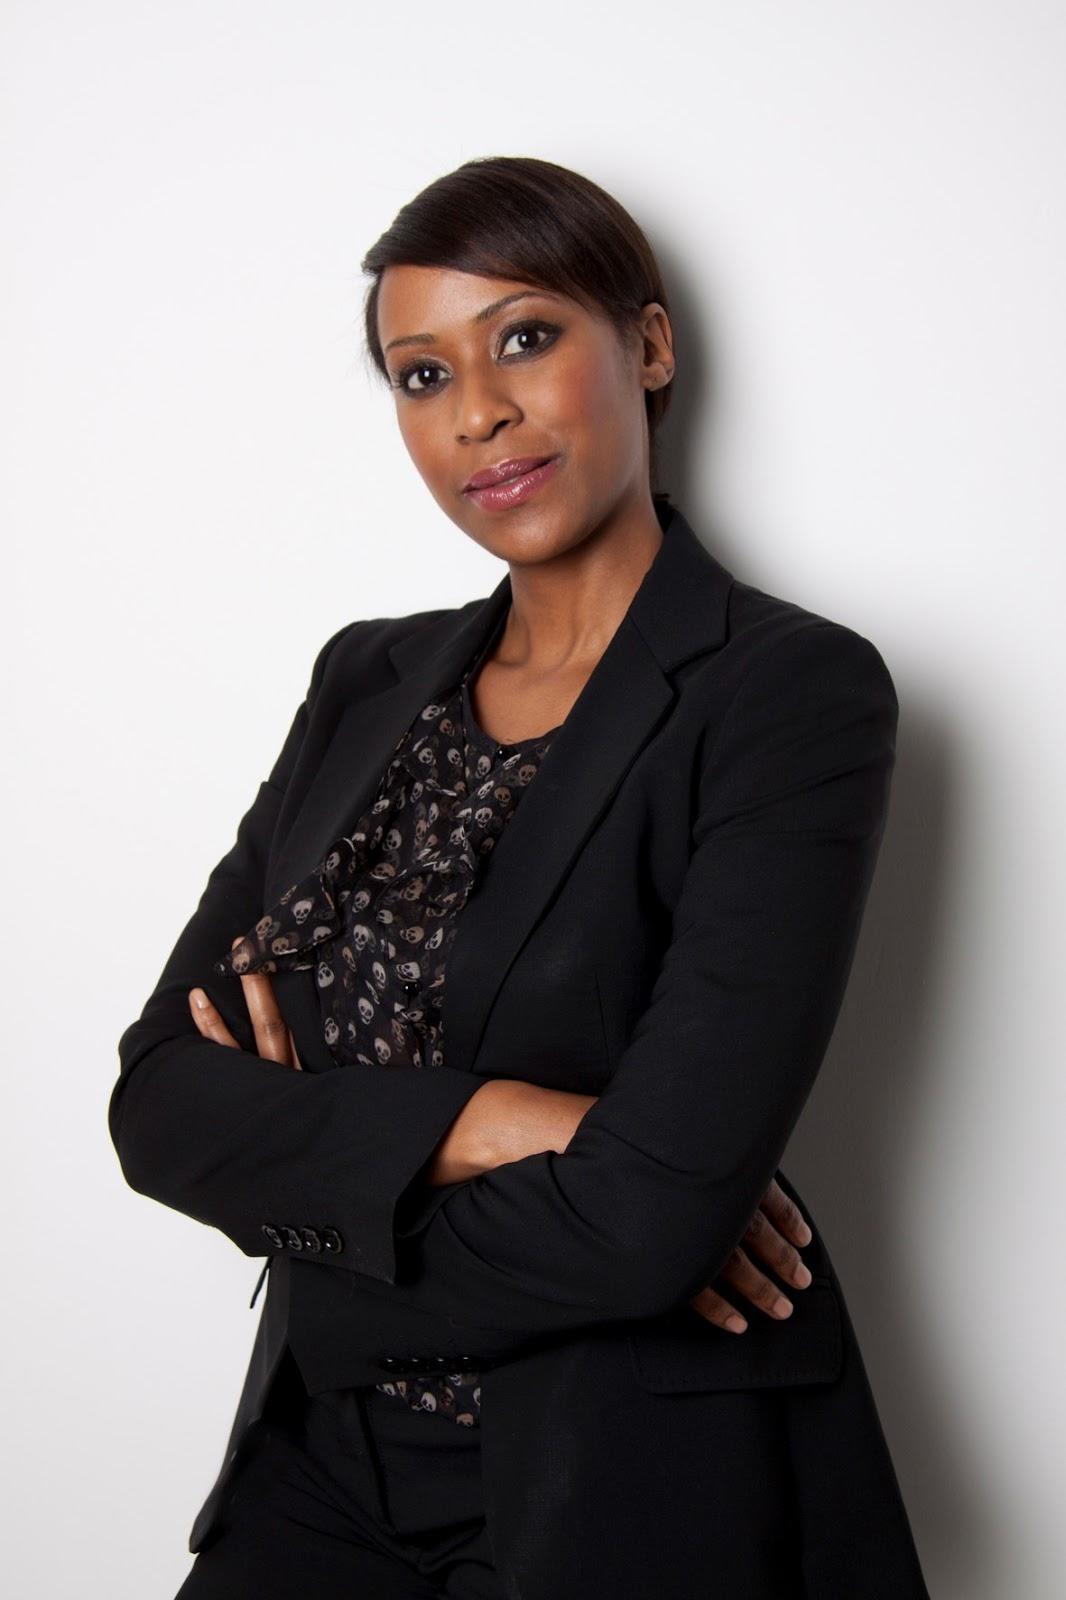 A conversation with skincare expert Antonia Burrell